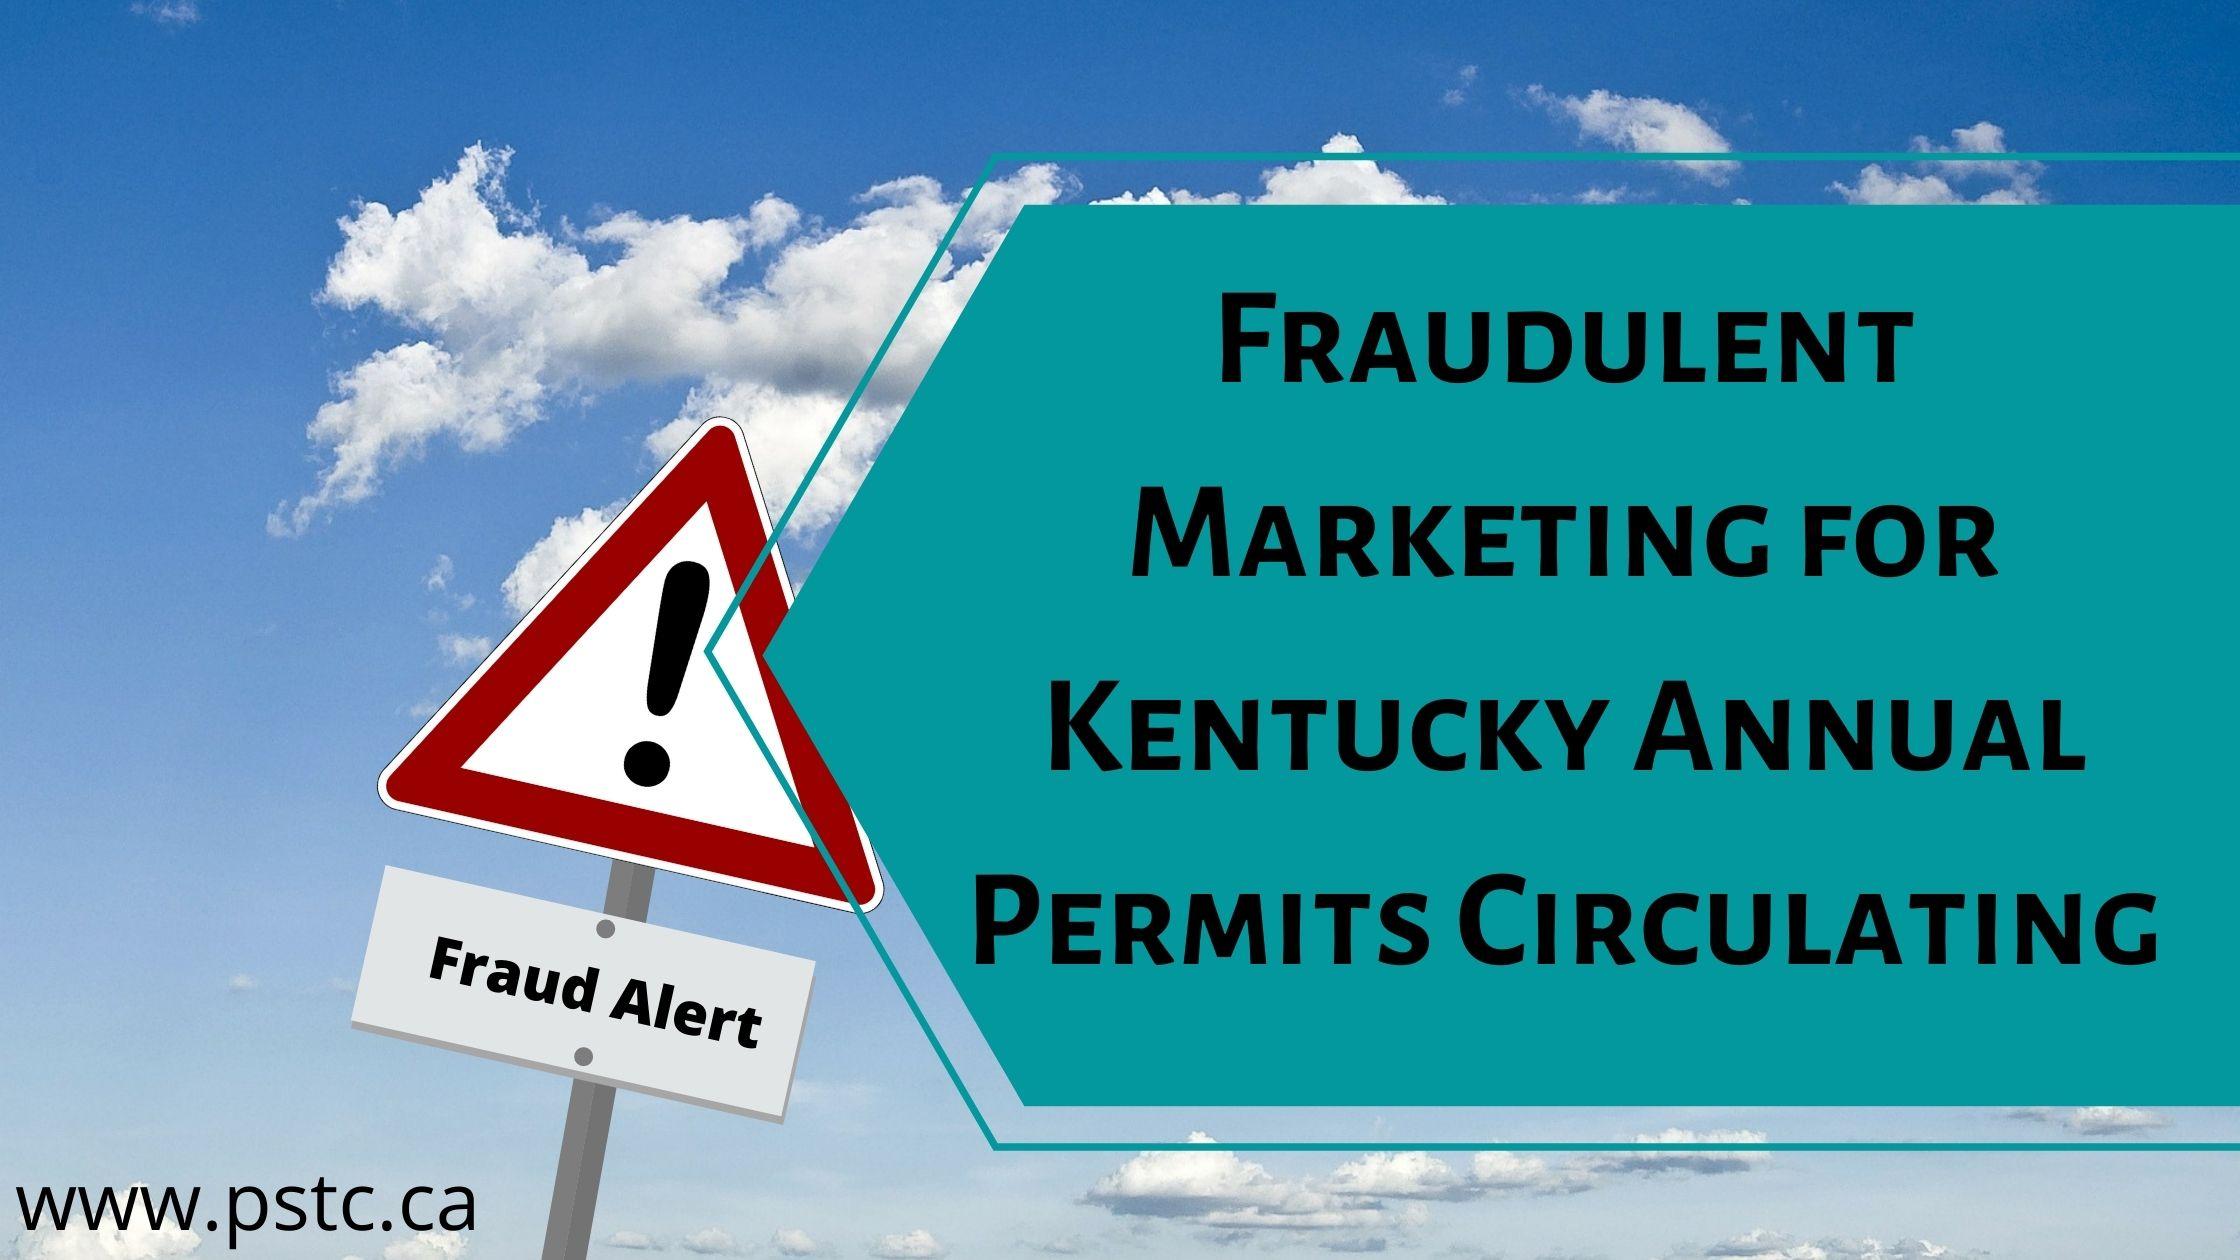 Fraudulent Marketing for KYU Annual Permits Circulating